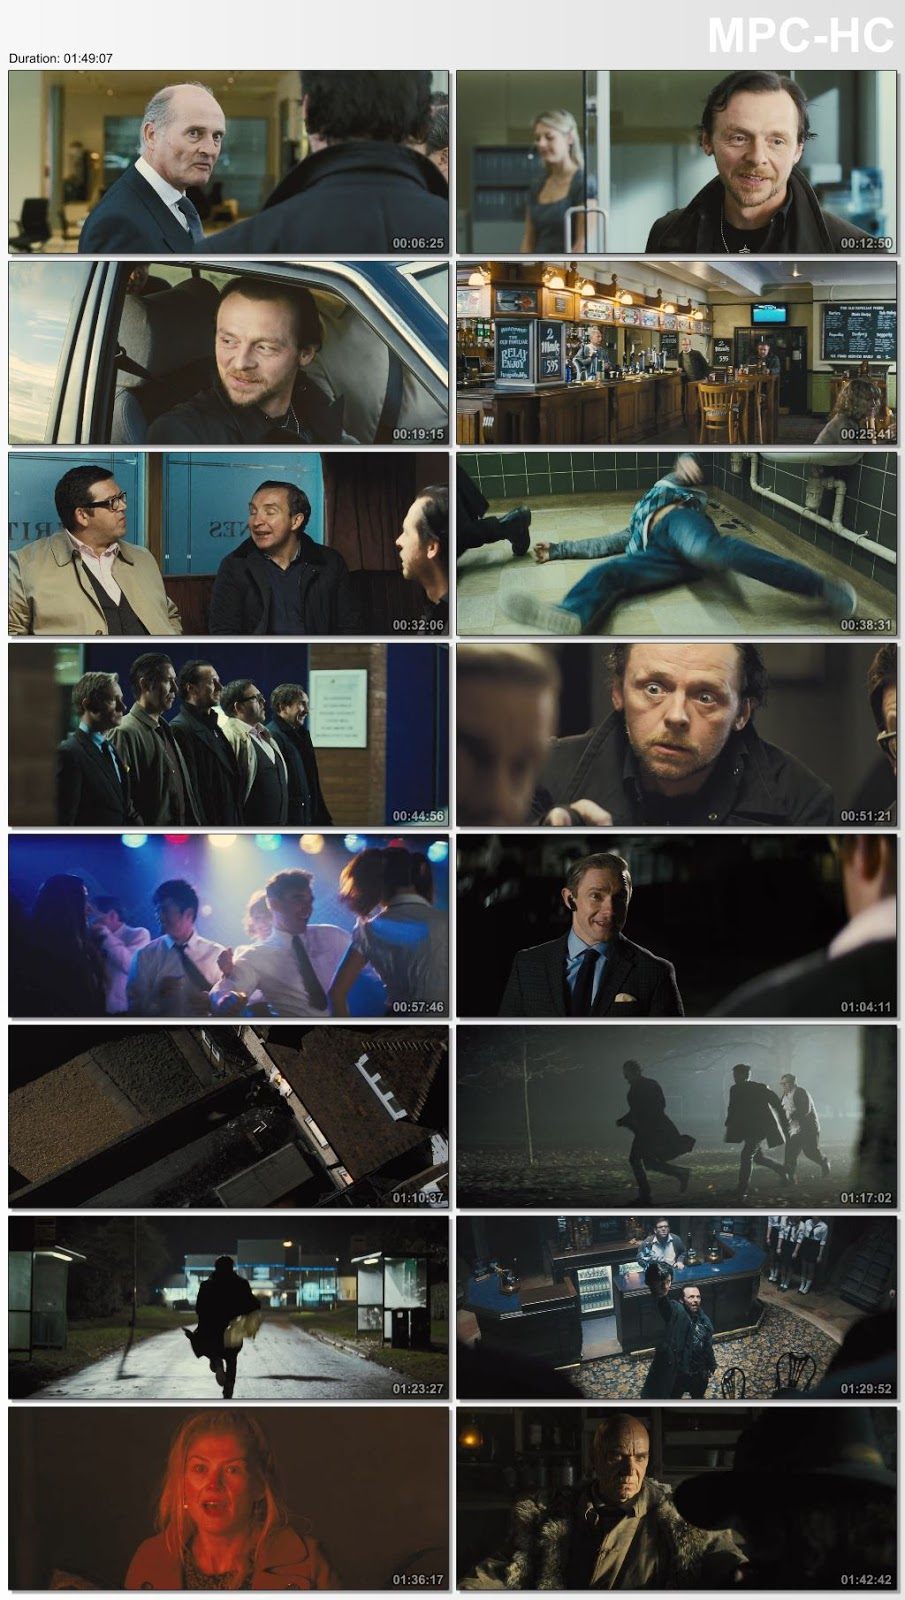 raid full movie download 480p mkv